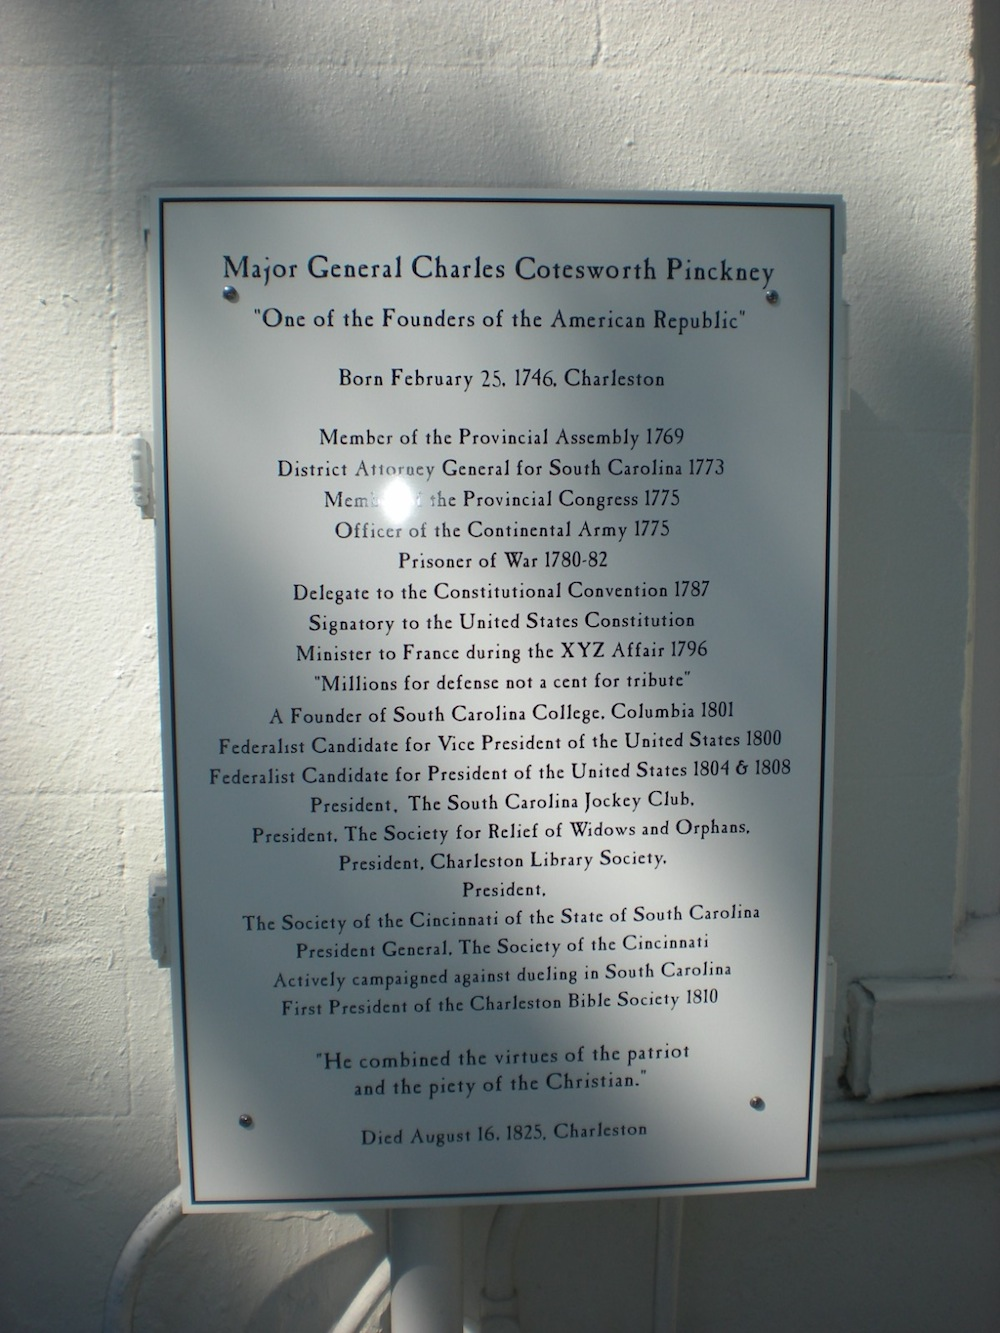 MGen Charles Cotesworth Pinckney